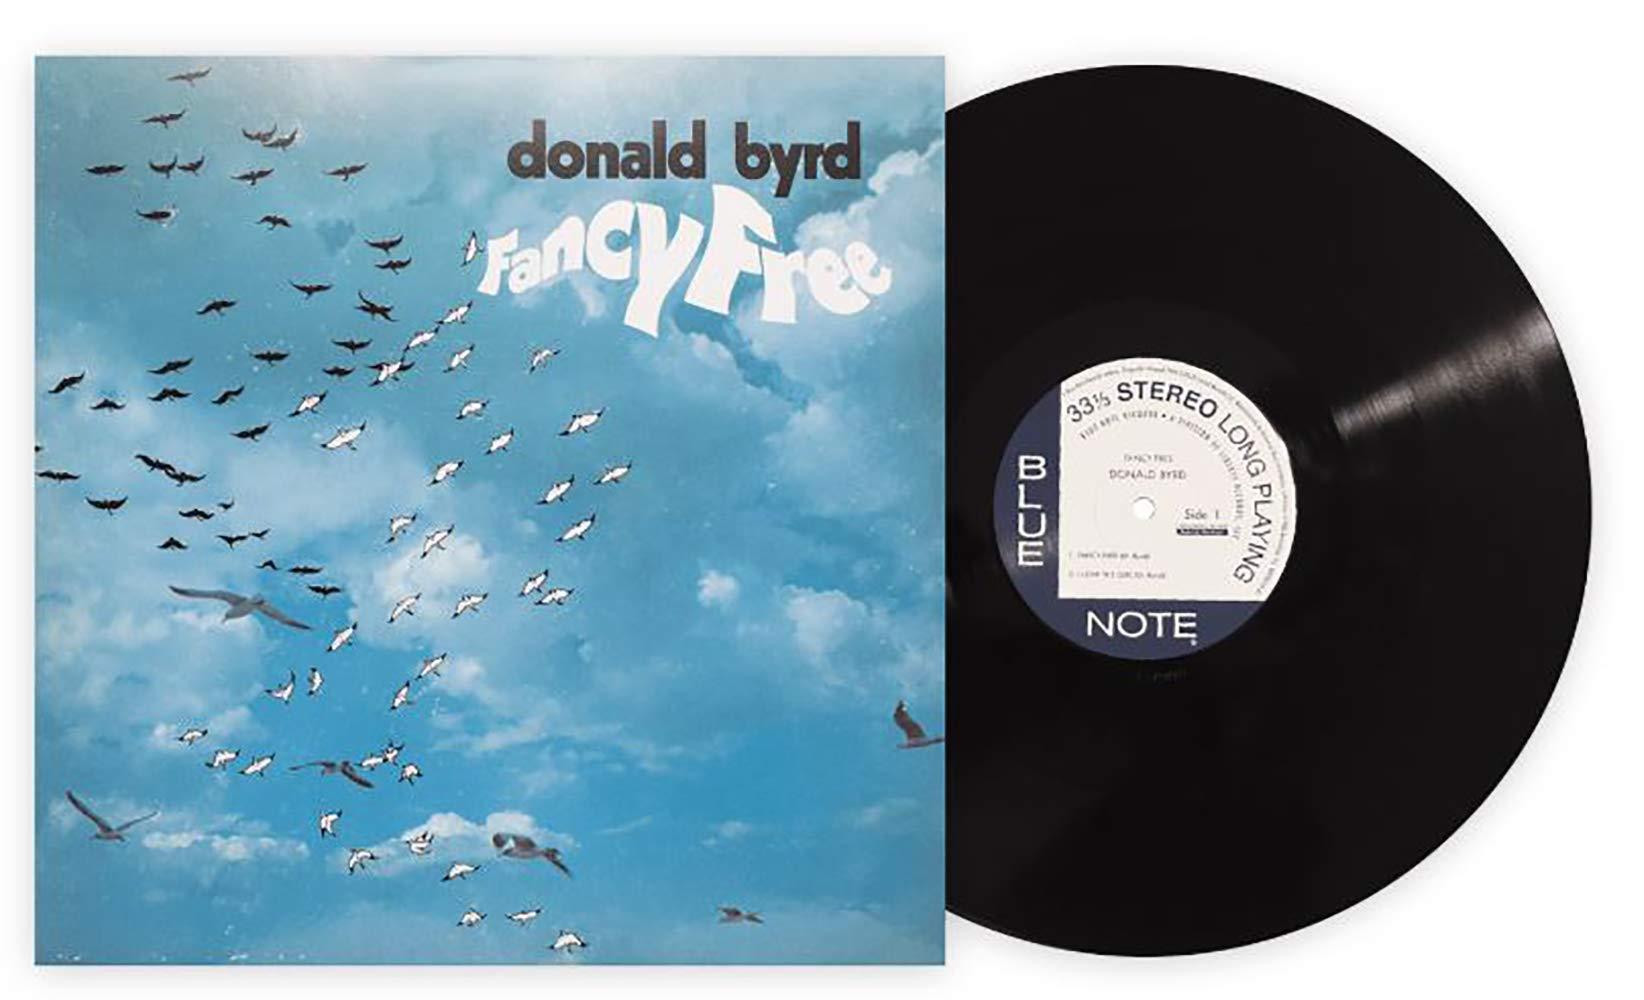 Donald Byrd - Fancy Free (180g Black Vinyl Edition) by Blue Note